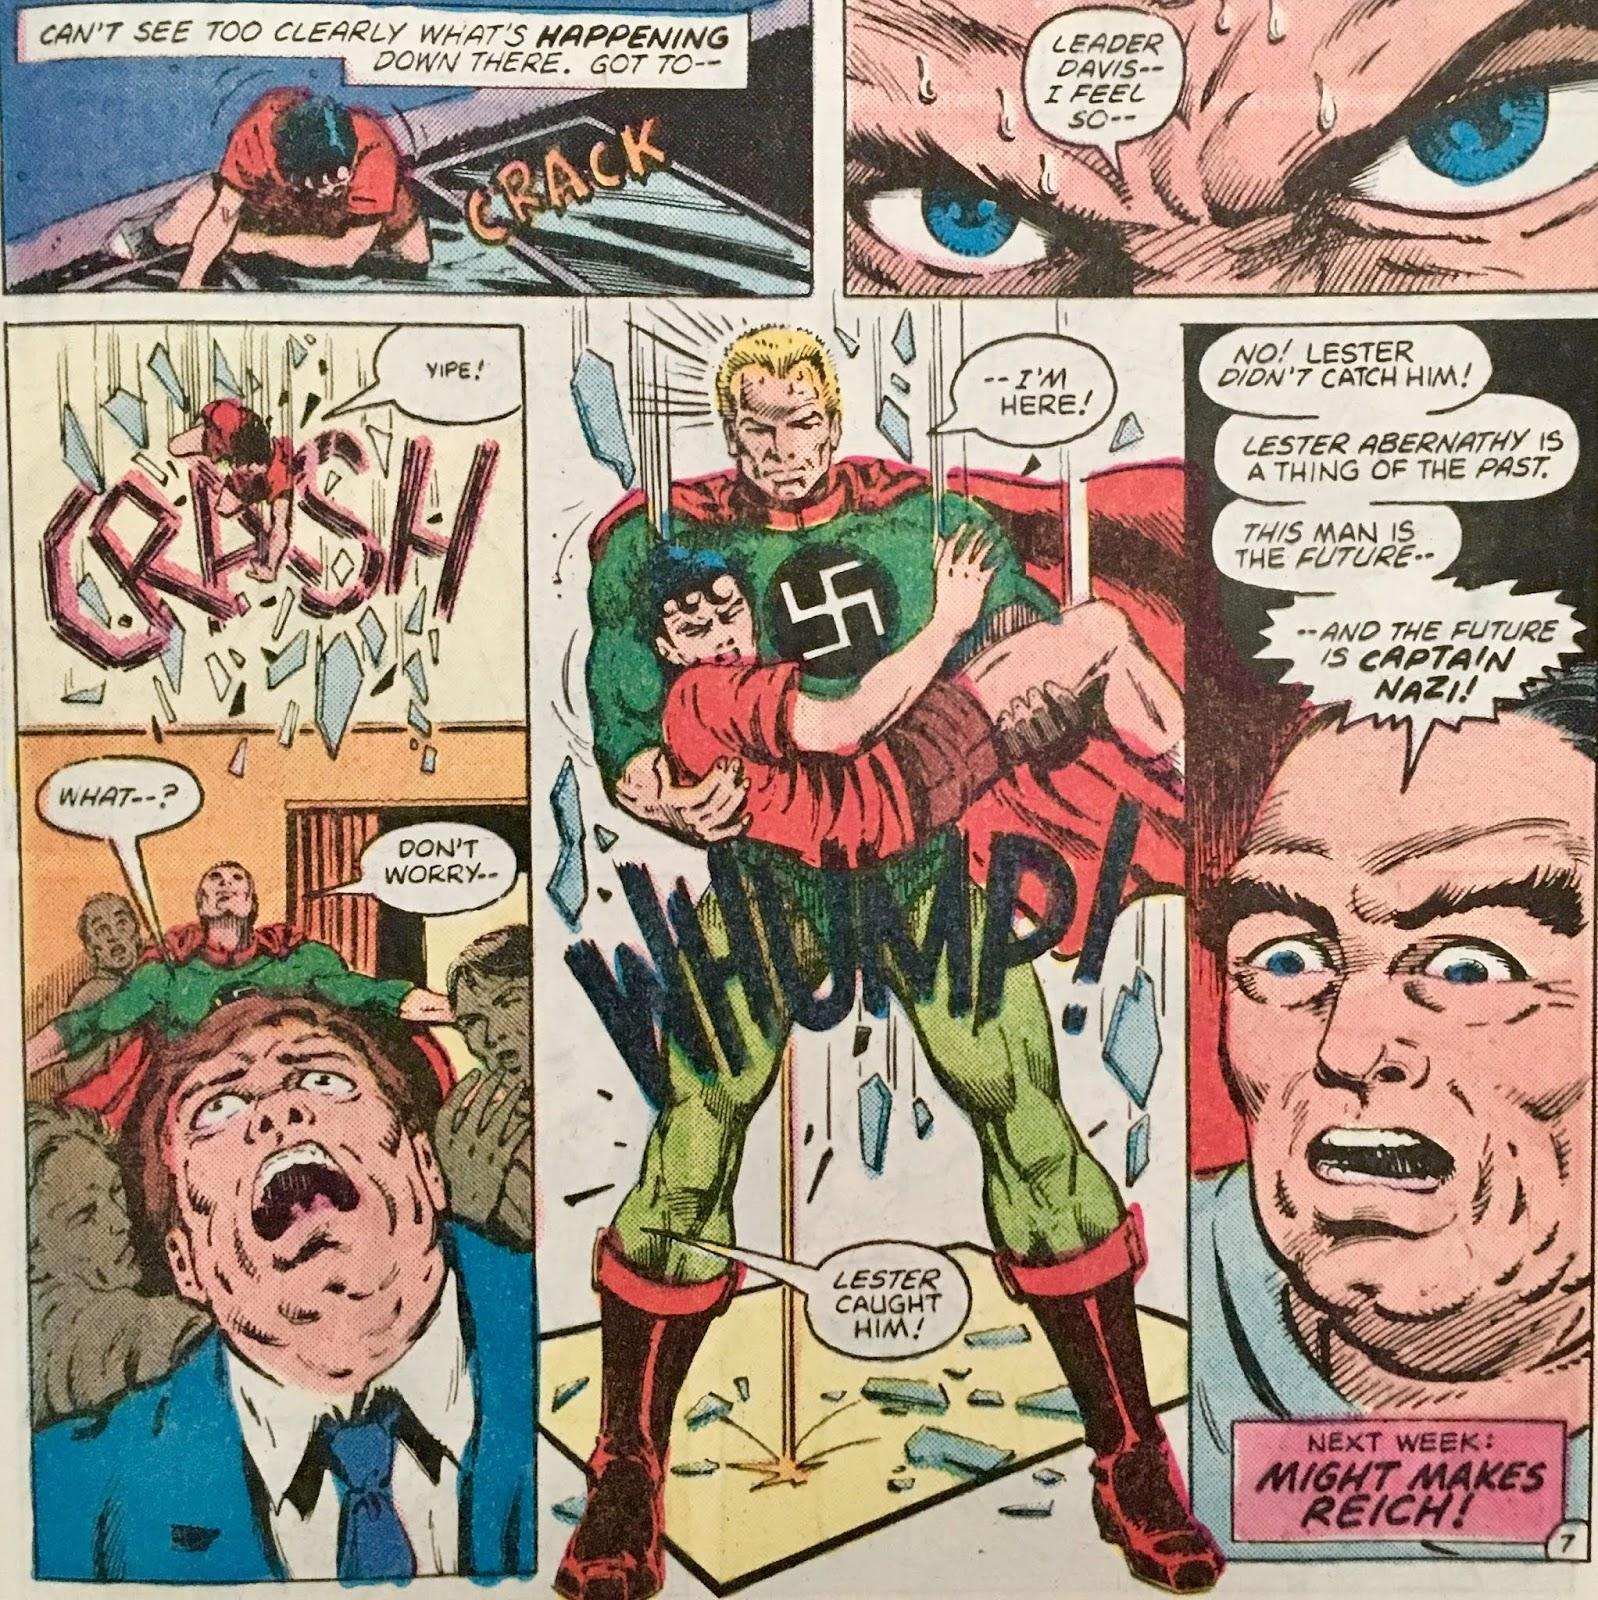 Chris is on Infinite Earths: ACW #624 - Shazam!